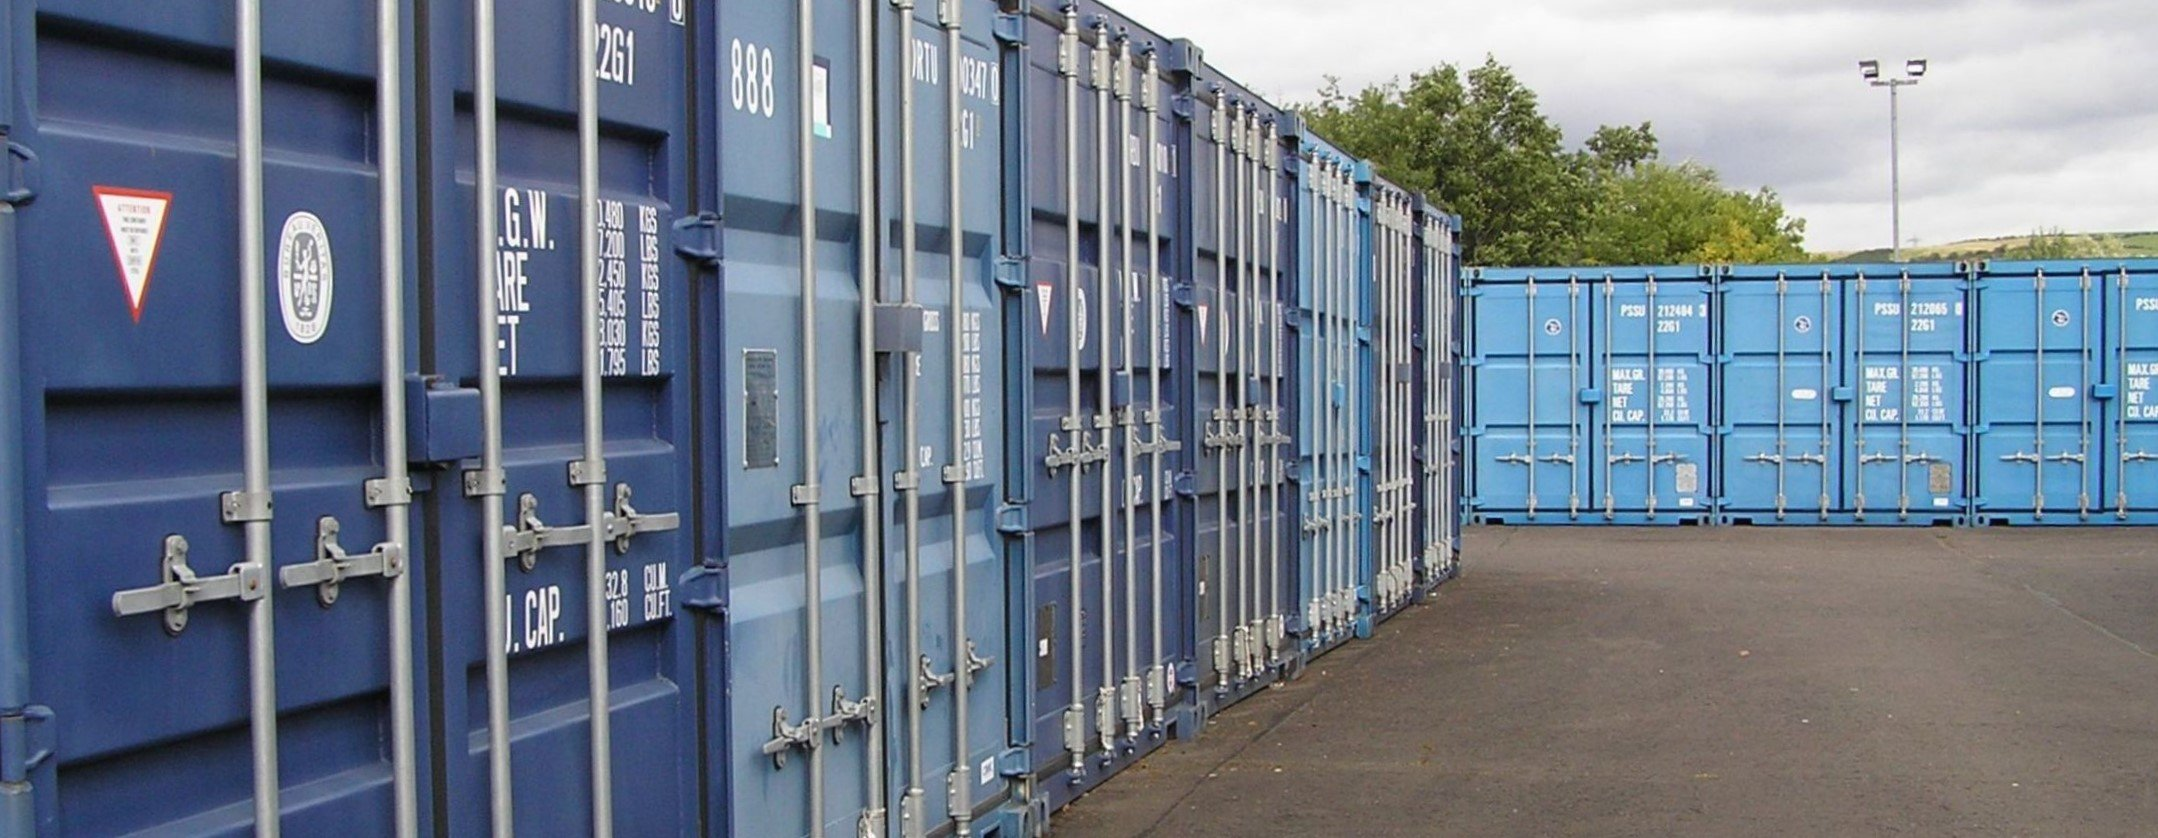 Archive storage facilities